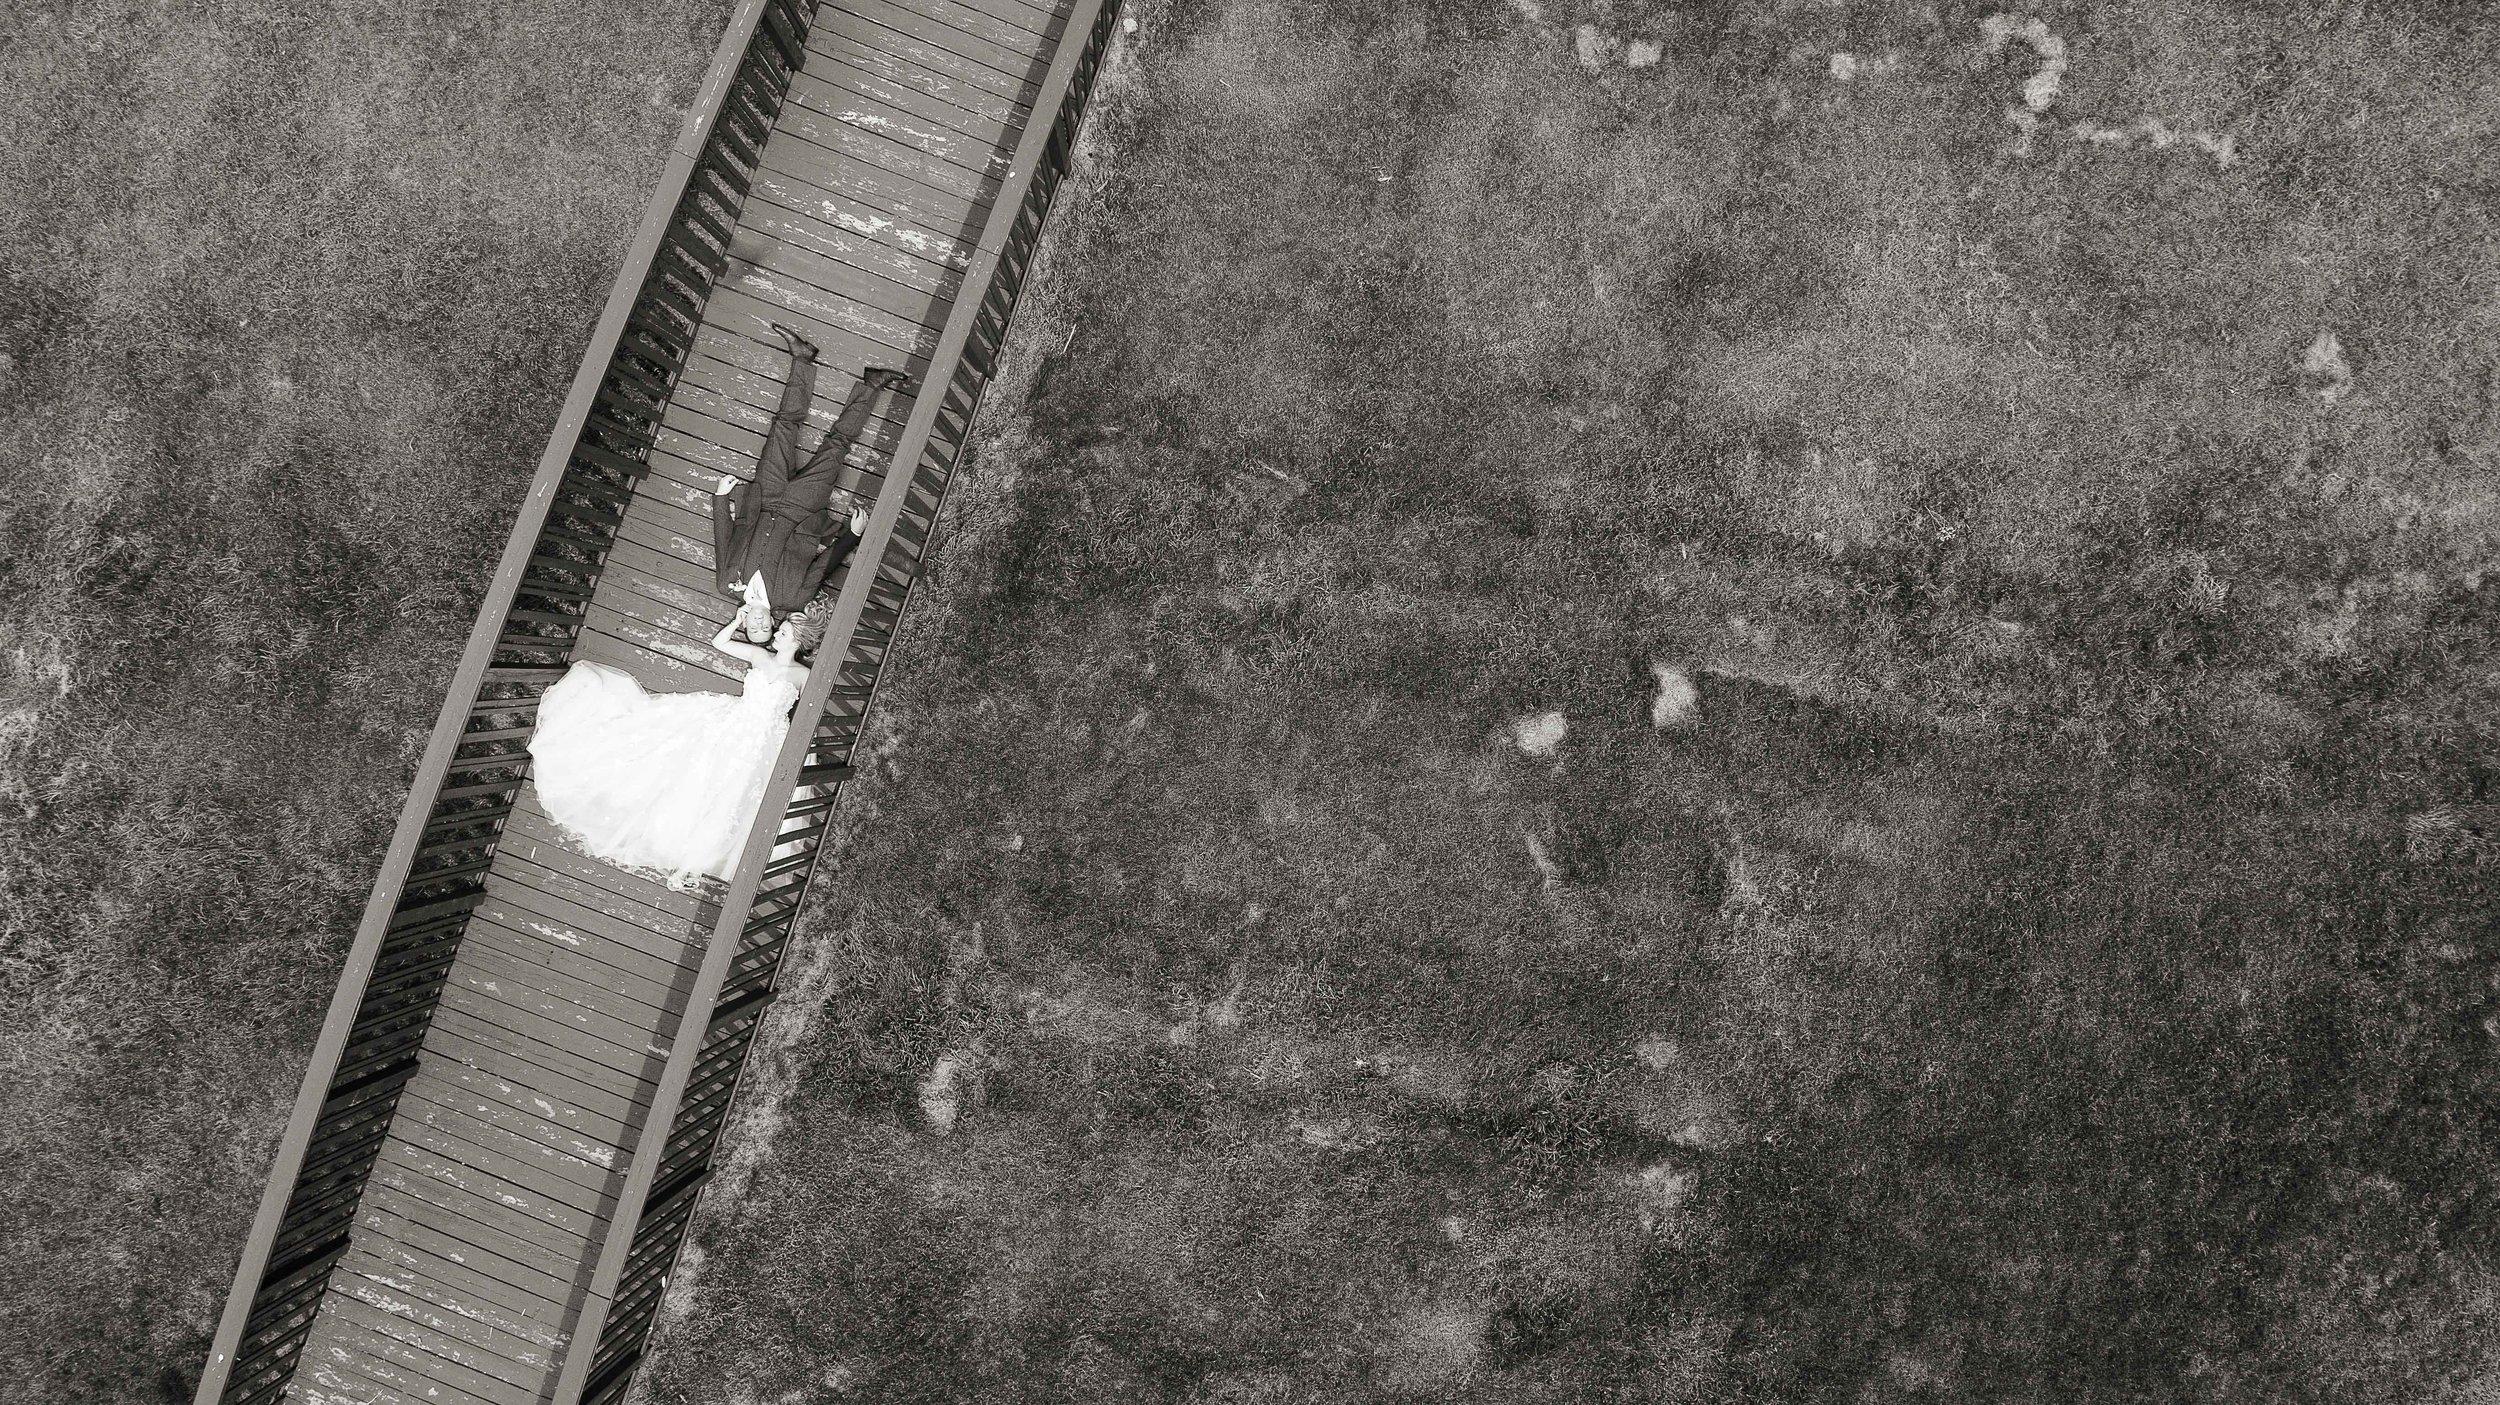 Drone photos-18-1.jpg